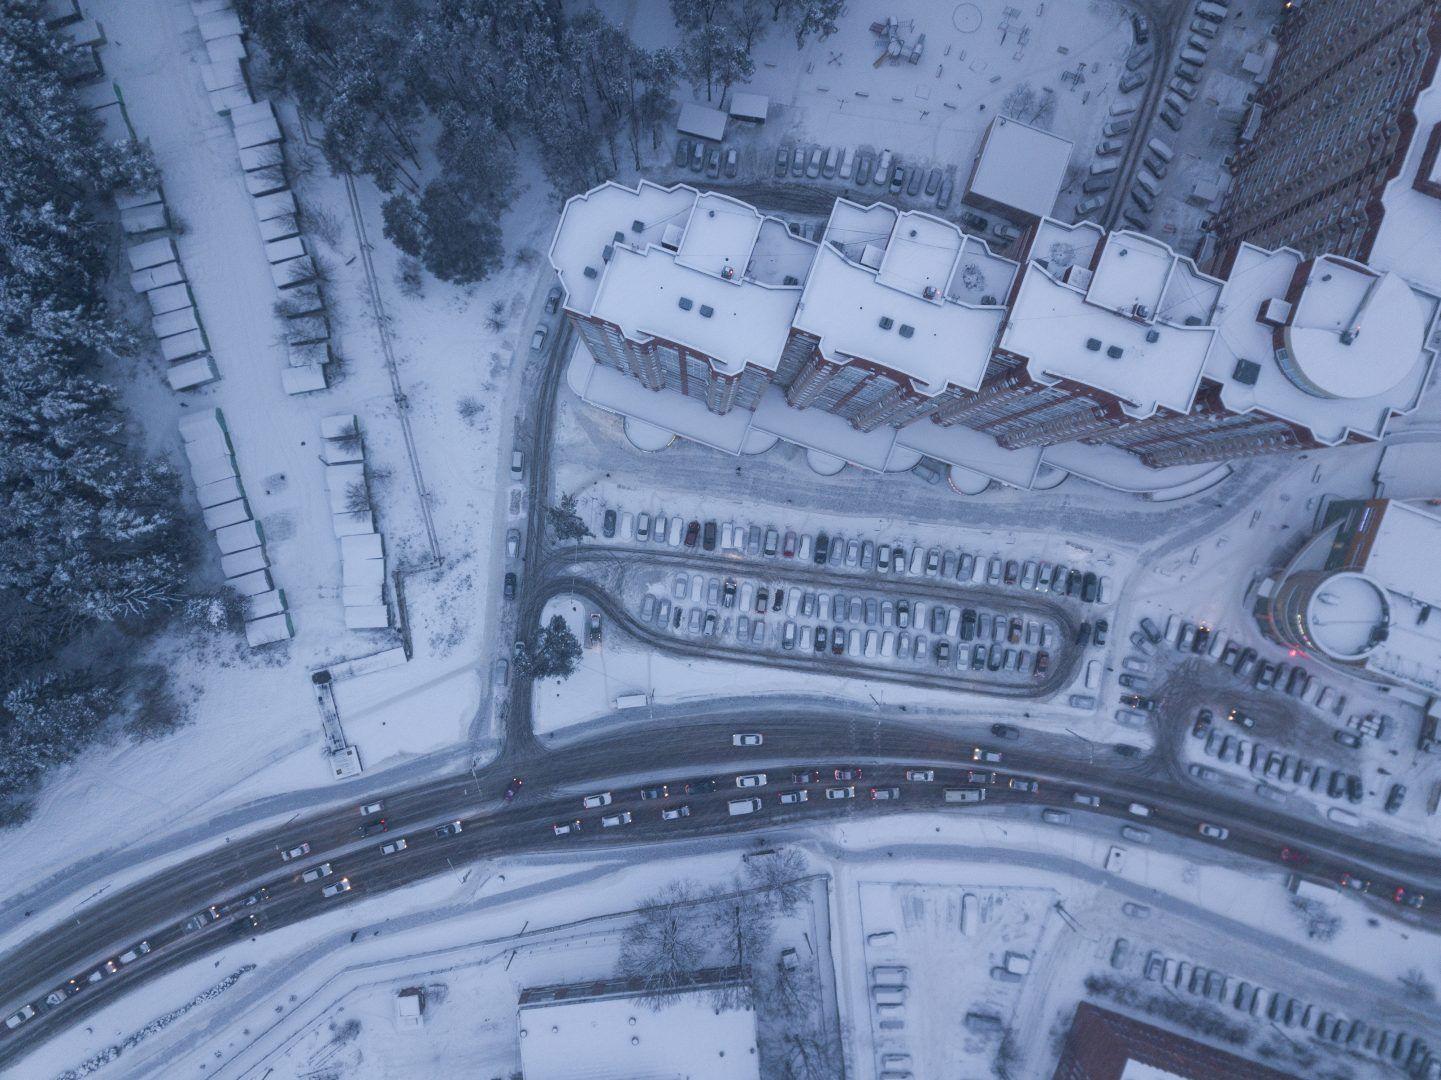 Многоуровневая транспортная развязка появится в Новой Москве. Фото: Александр Кожохин, «Вечерняя Москва»